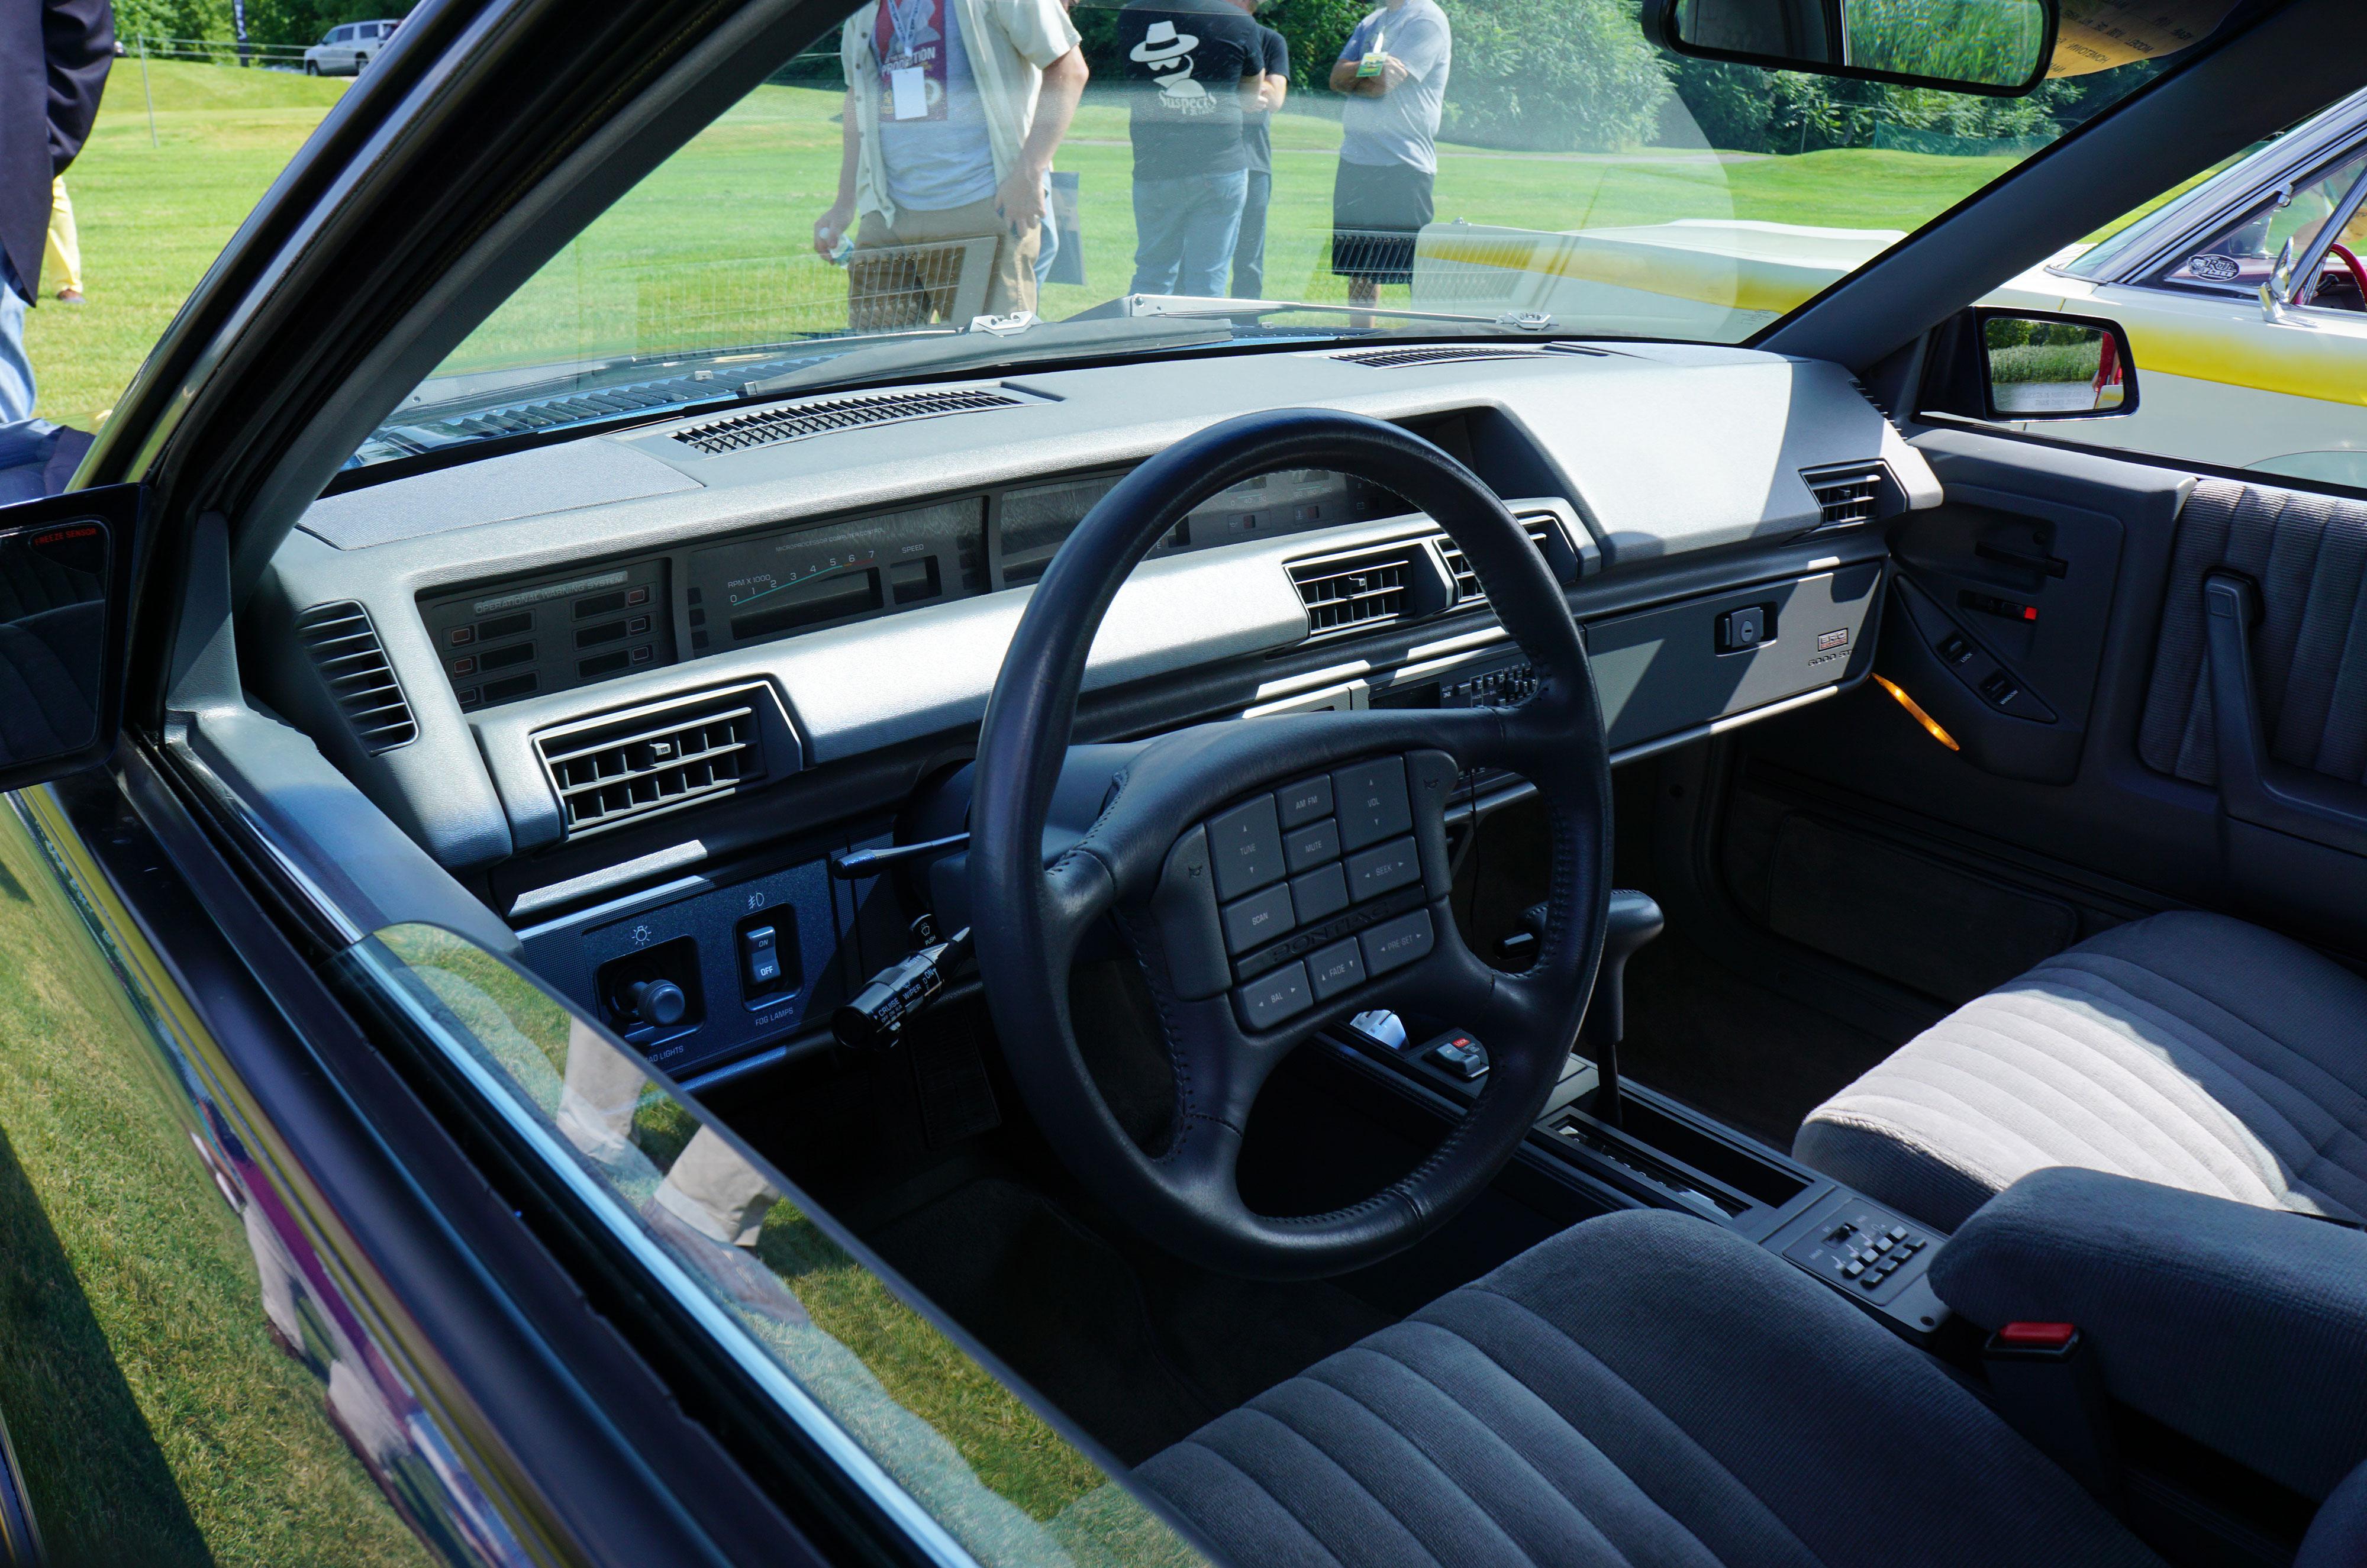 pontiac ste inteiror steering wheel buttons concour lemons michigan 2018